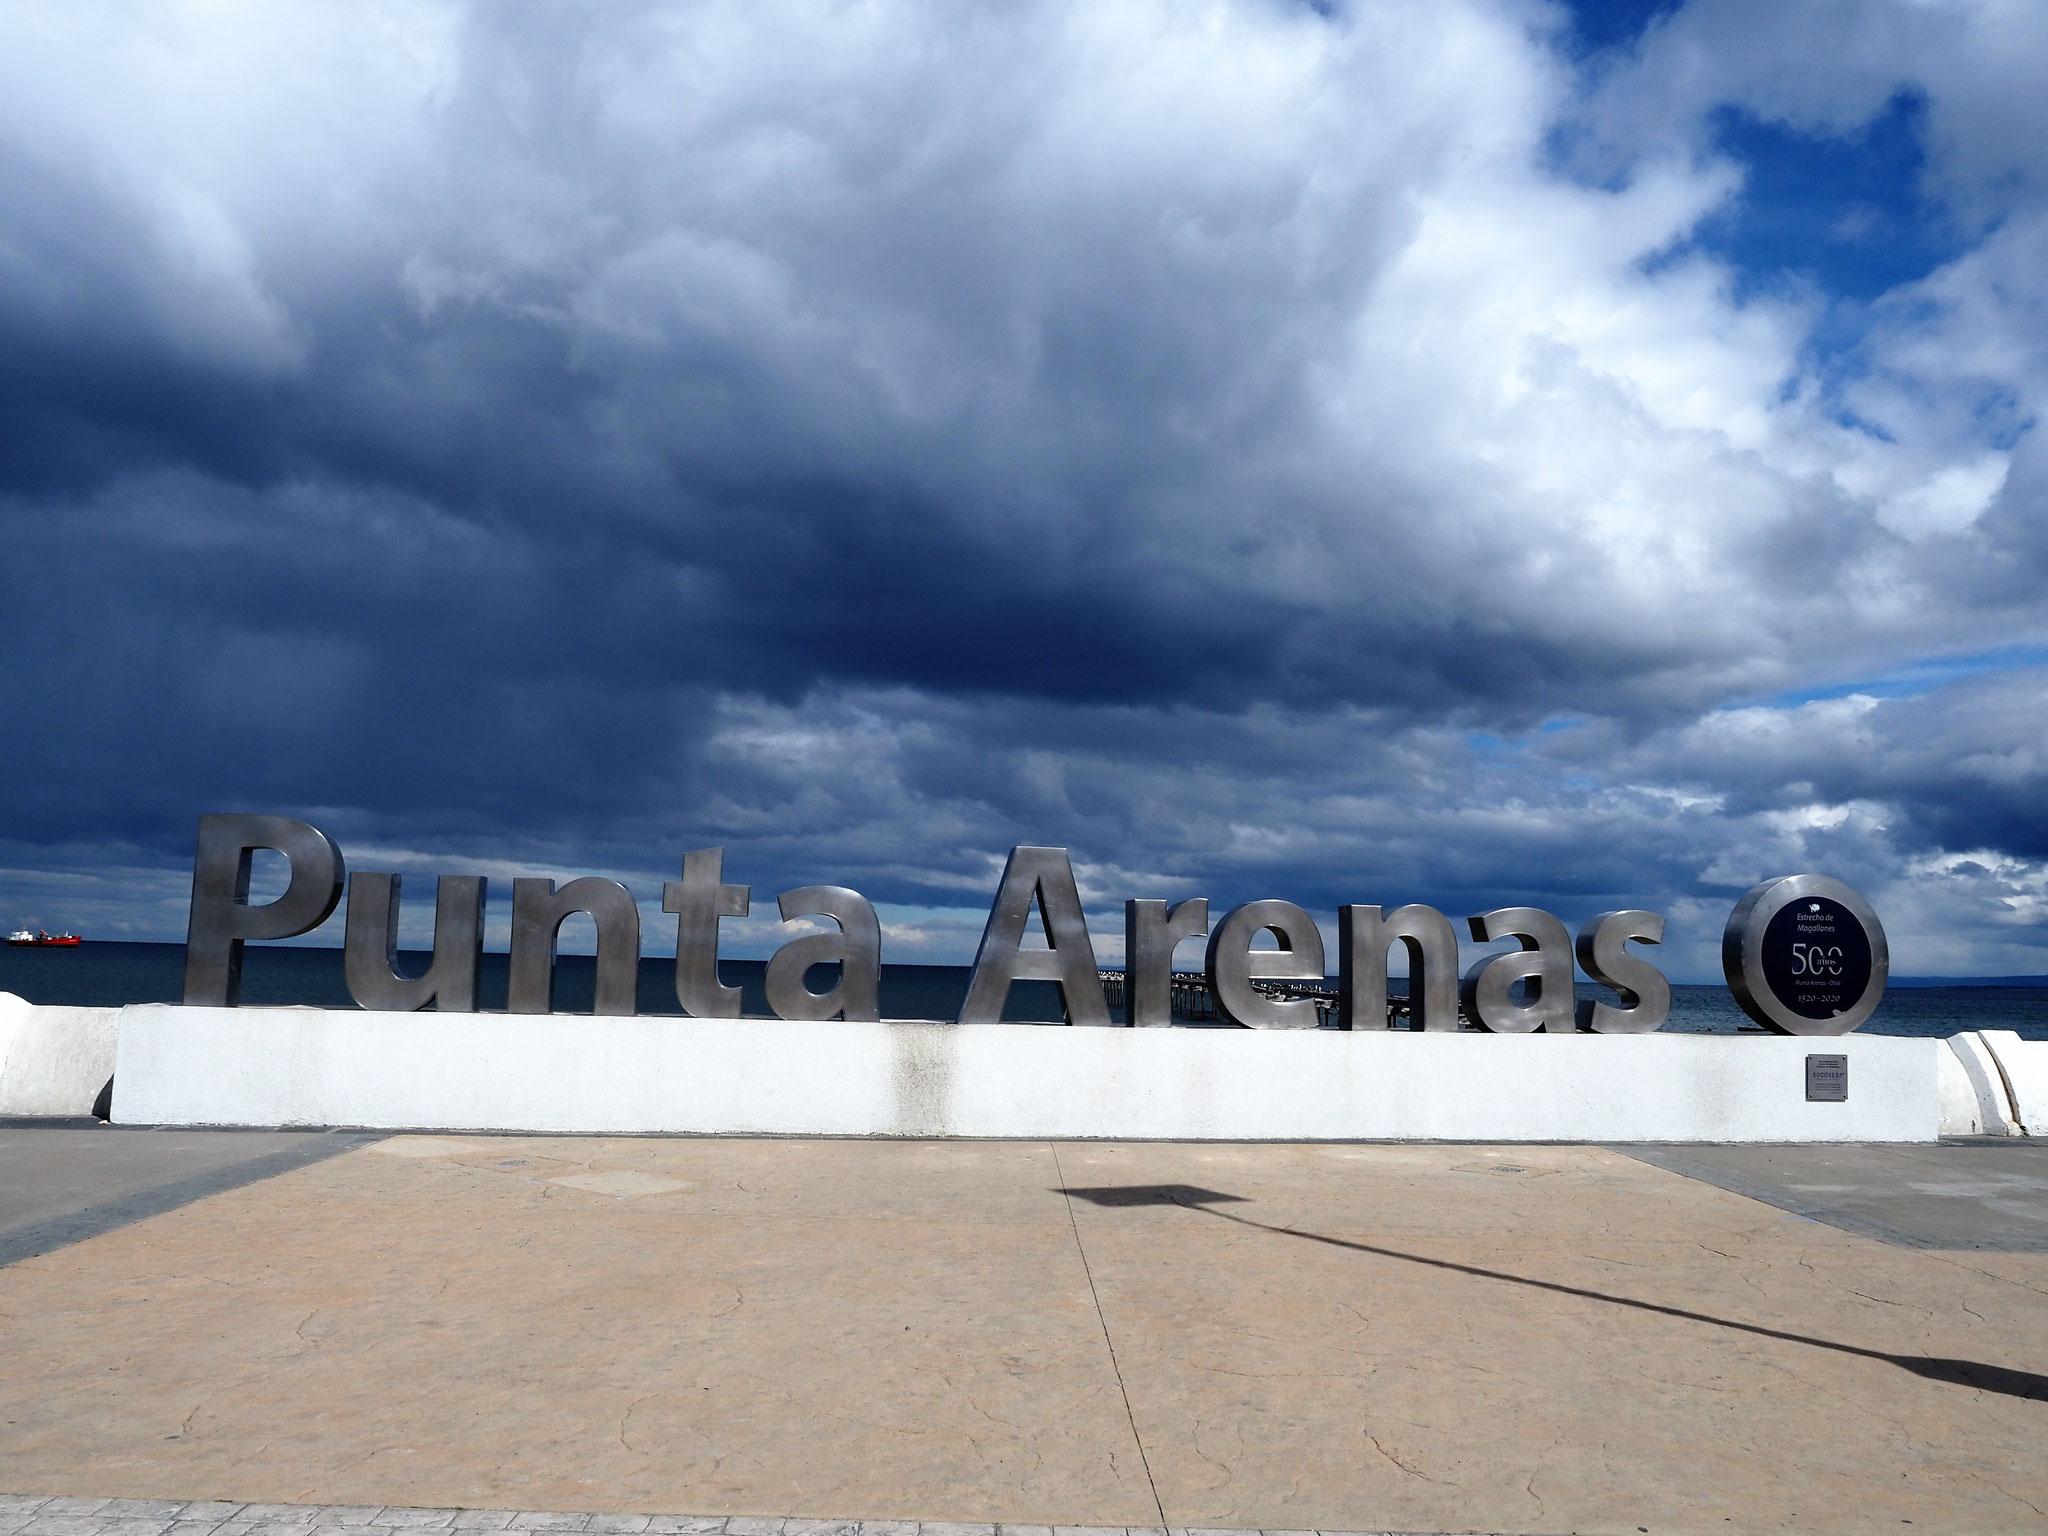 Ende unserer Patoagonienreise: Punta Arenas